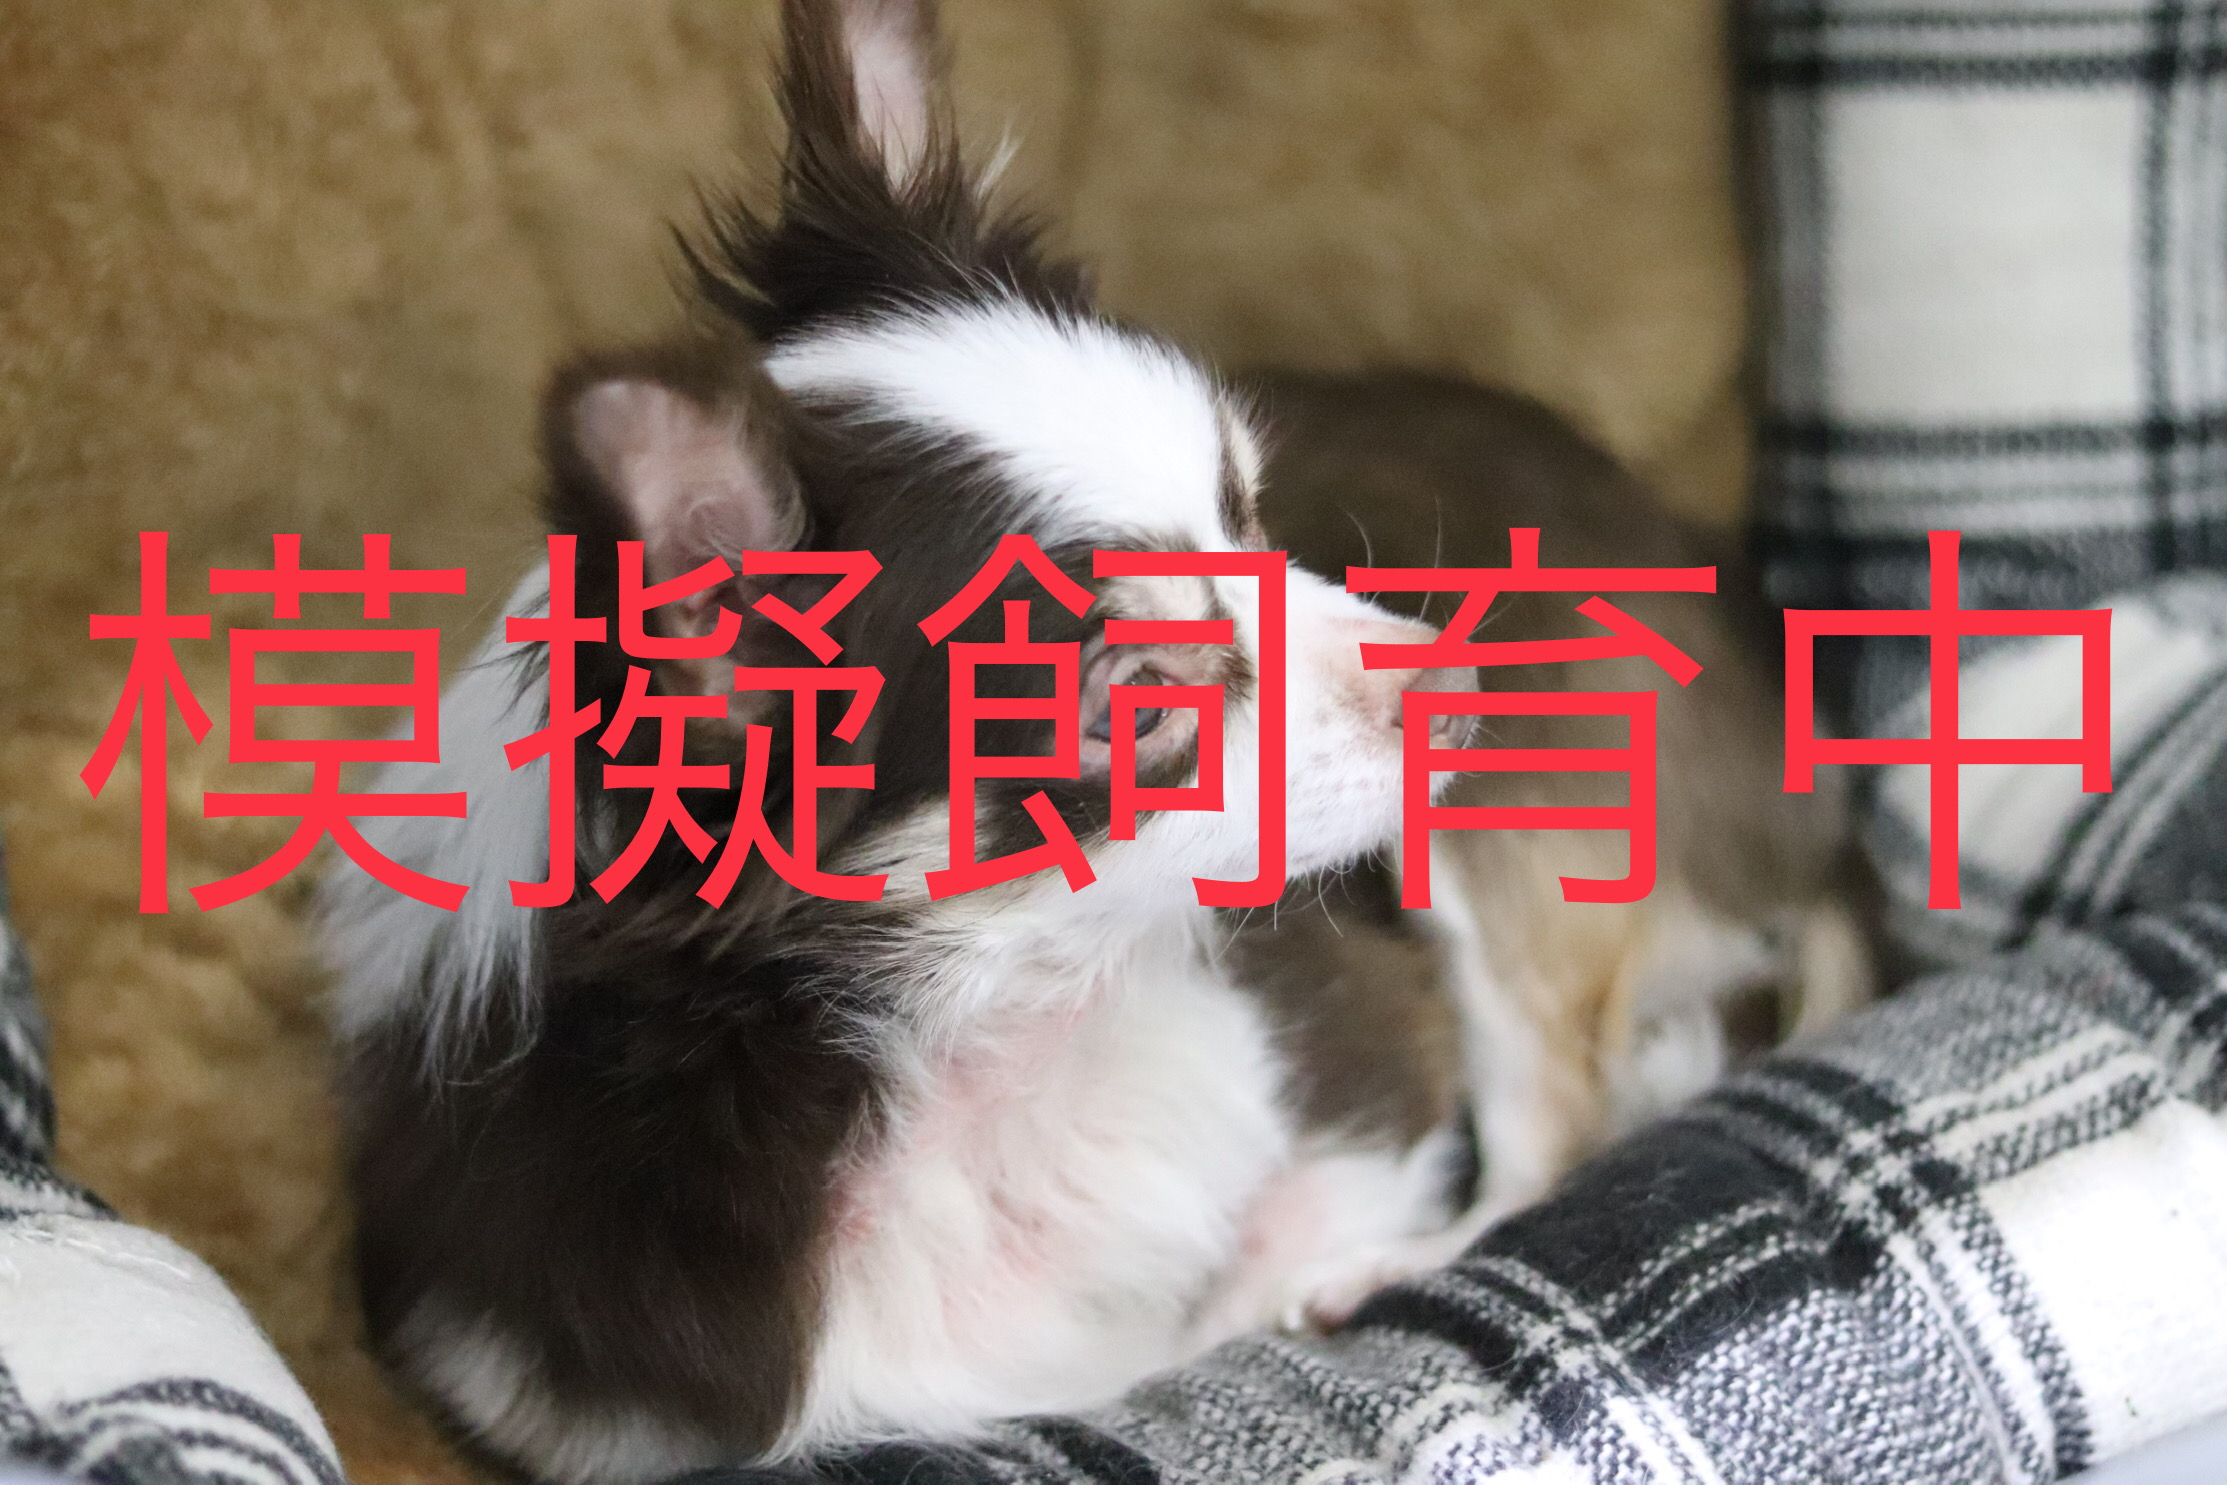 <ul> <li>犬種:ロングコートチワワ</li> <li>性別:女の子</li> <li>名前:ハナ</li> <li>年齢:2015.5.15</li> <li>保護経緯:家族の病気療養のため飼育困難</li> </ul>